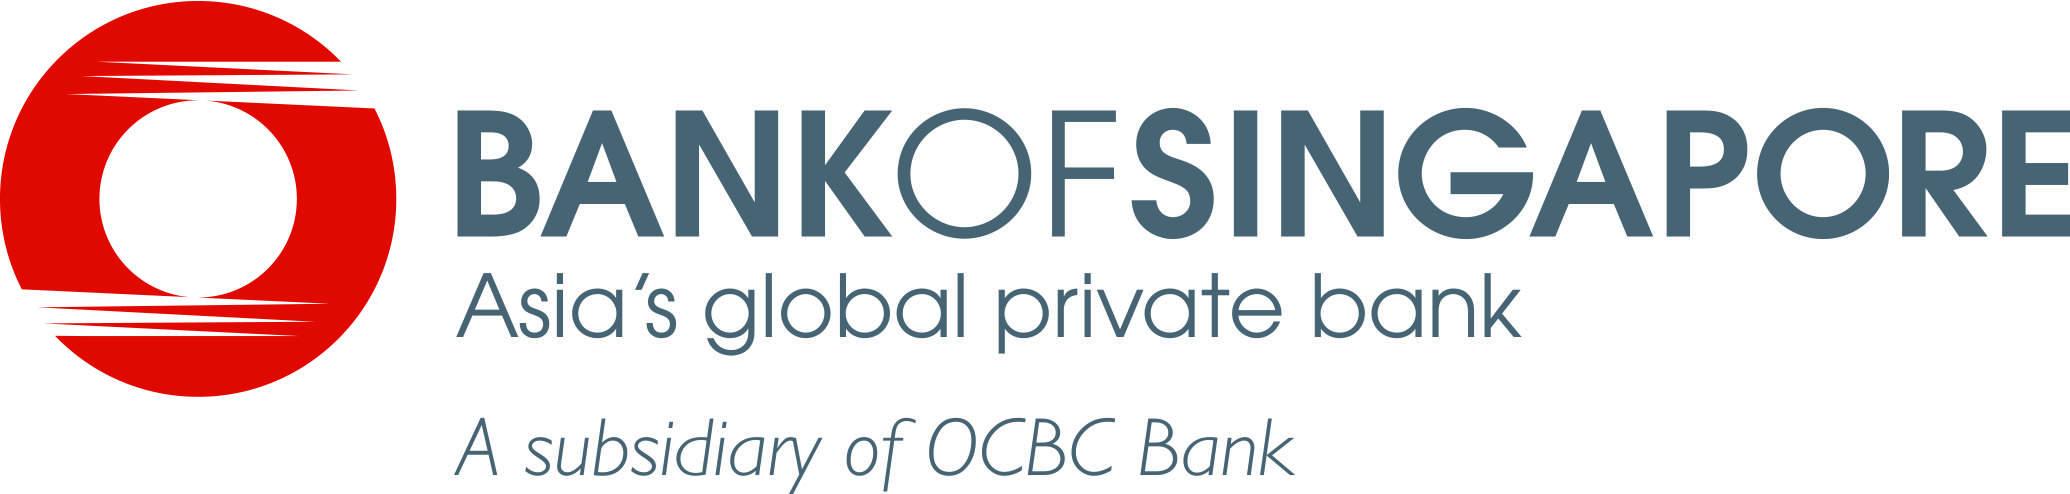 BOS-Logo-Asias-Global-Private-Bank-PBI14-ok-to-use-or-2016.jpg